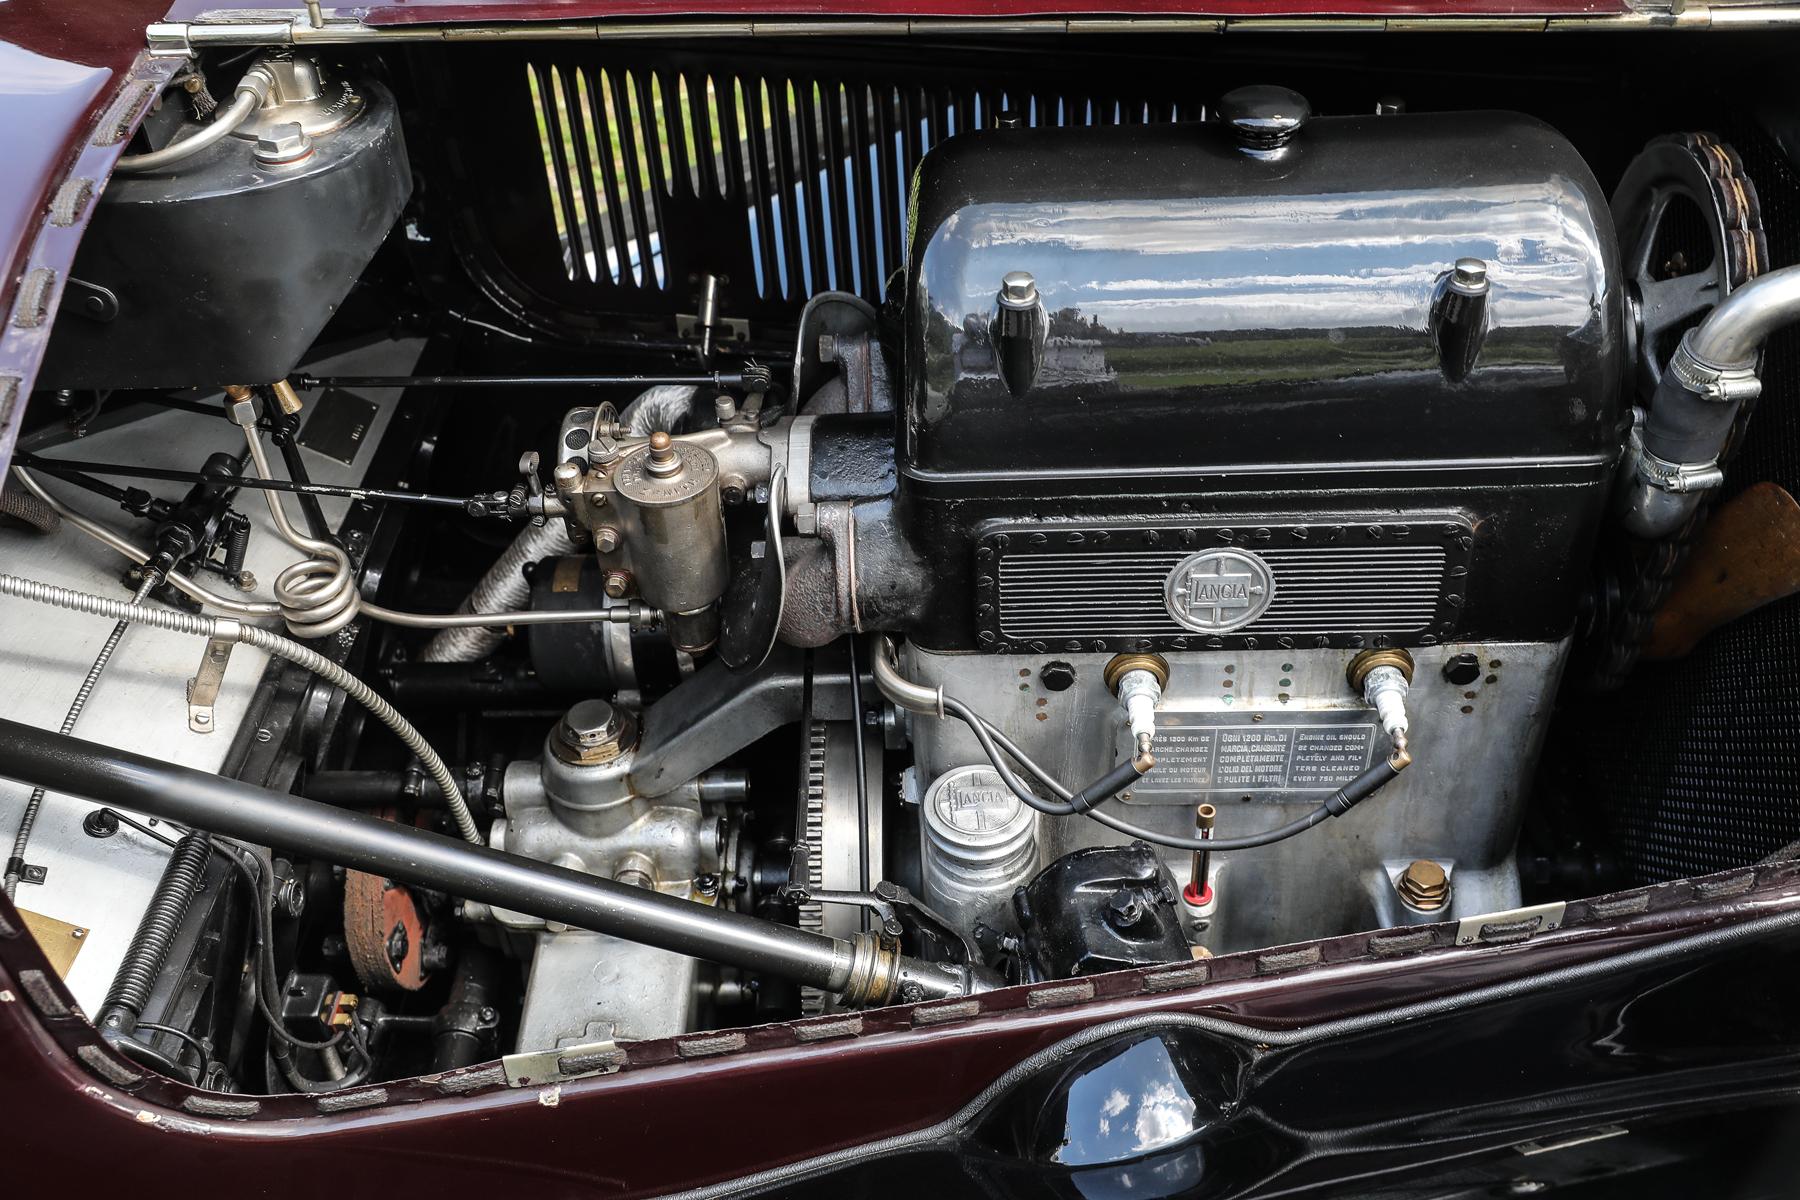 1924 Lancia Lambda Series III Torpedo engine V-4